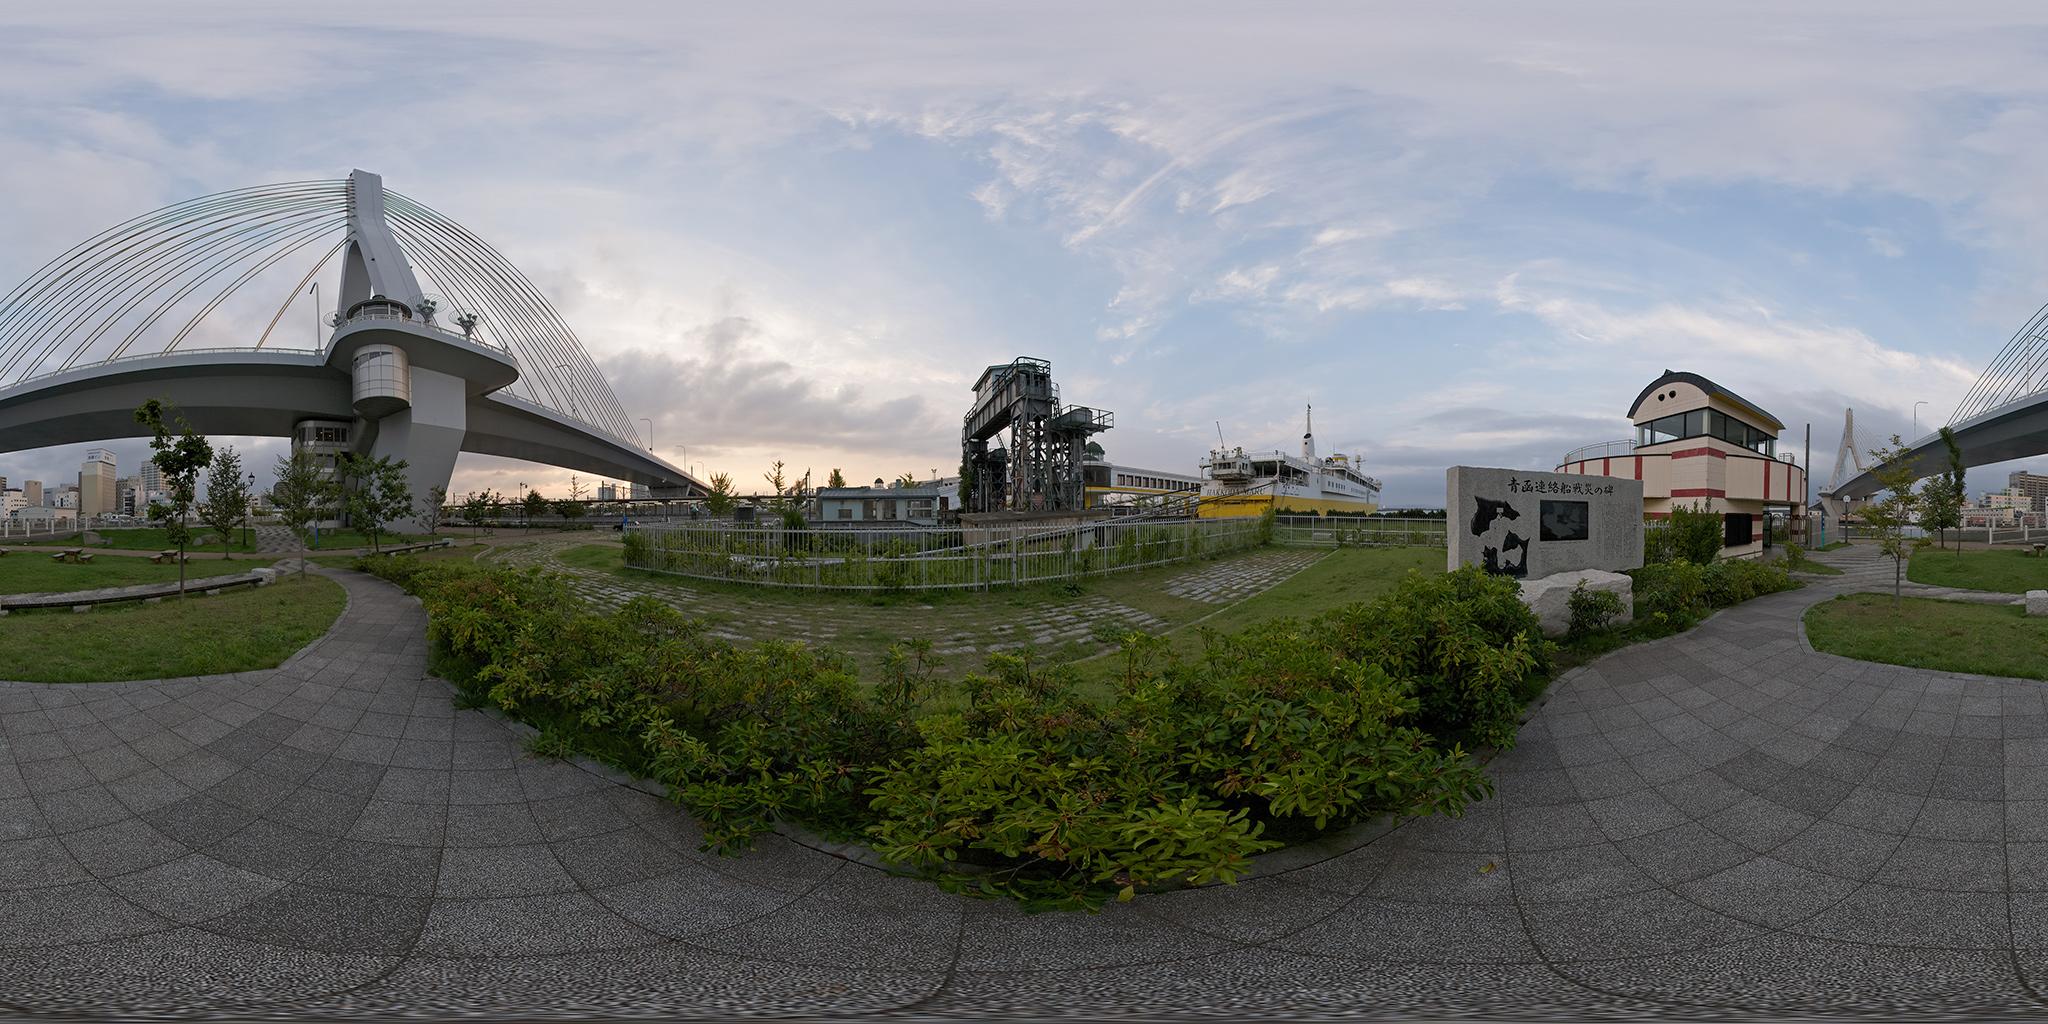 八甲田丸と青函連絡船戦災の碑